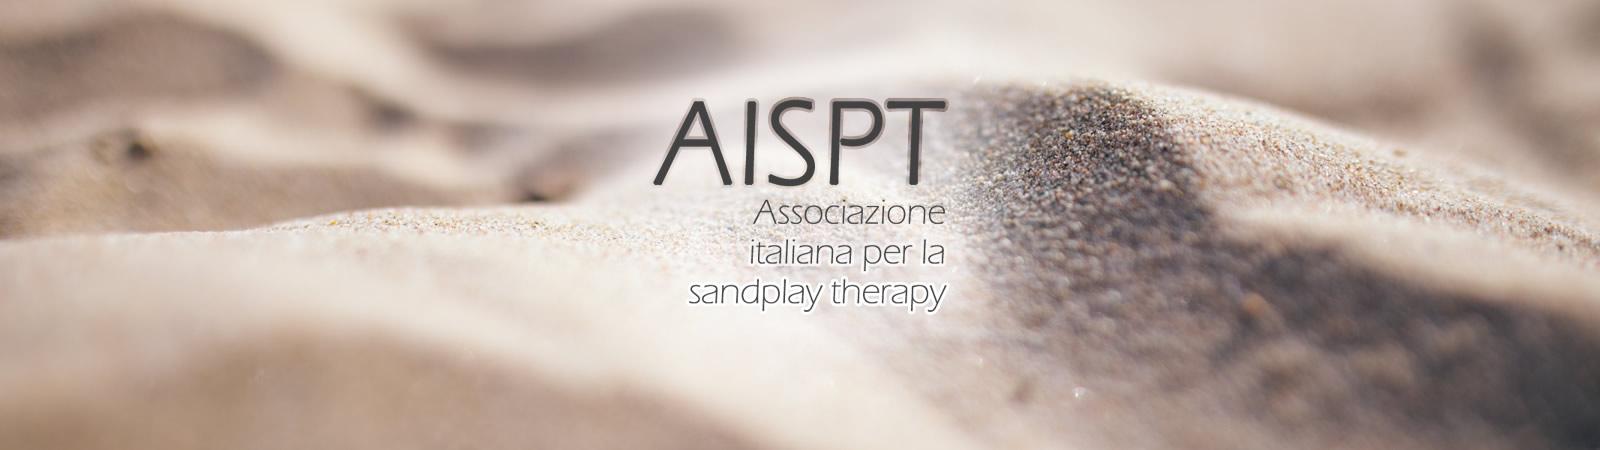 AISPT Header Image